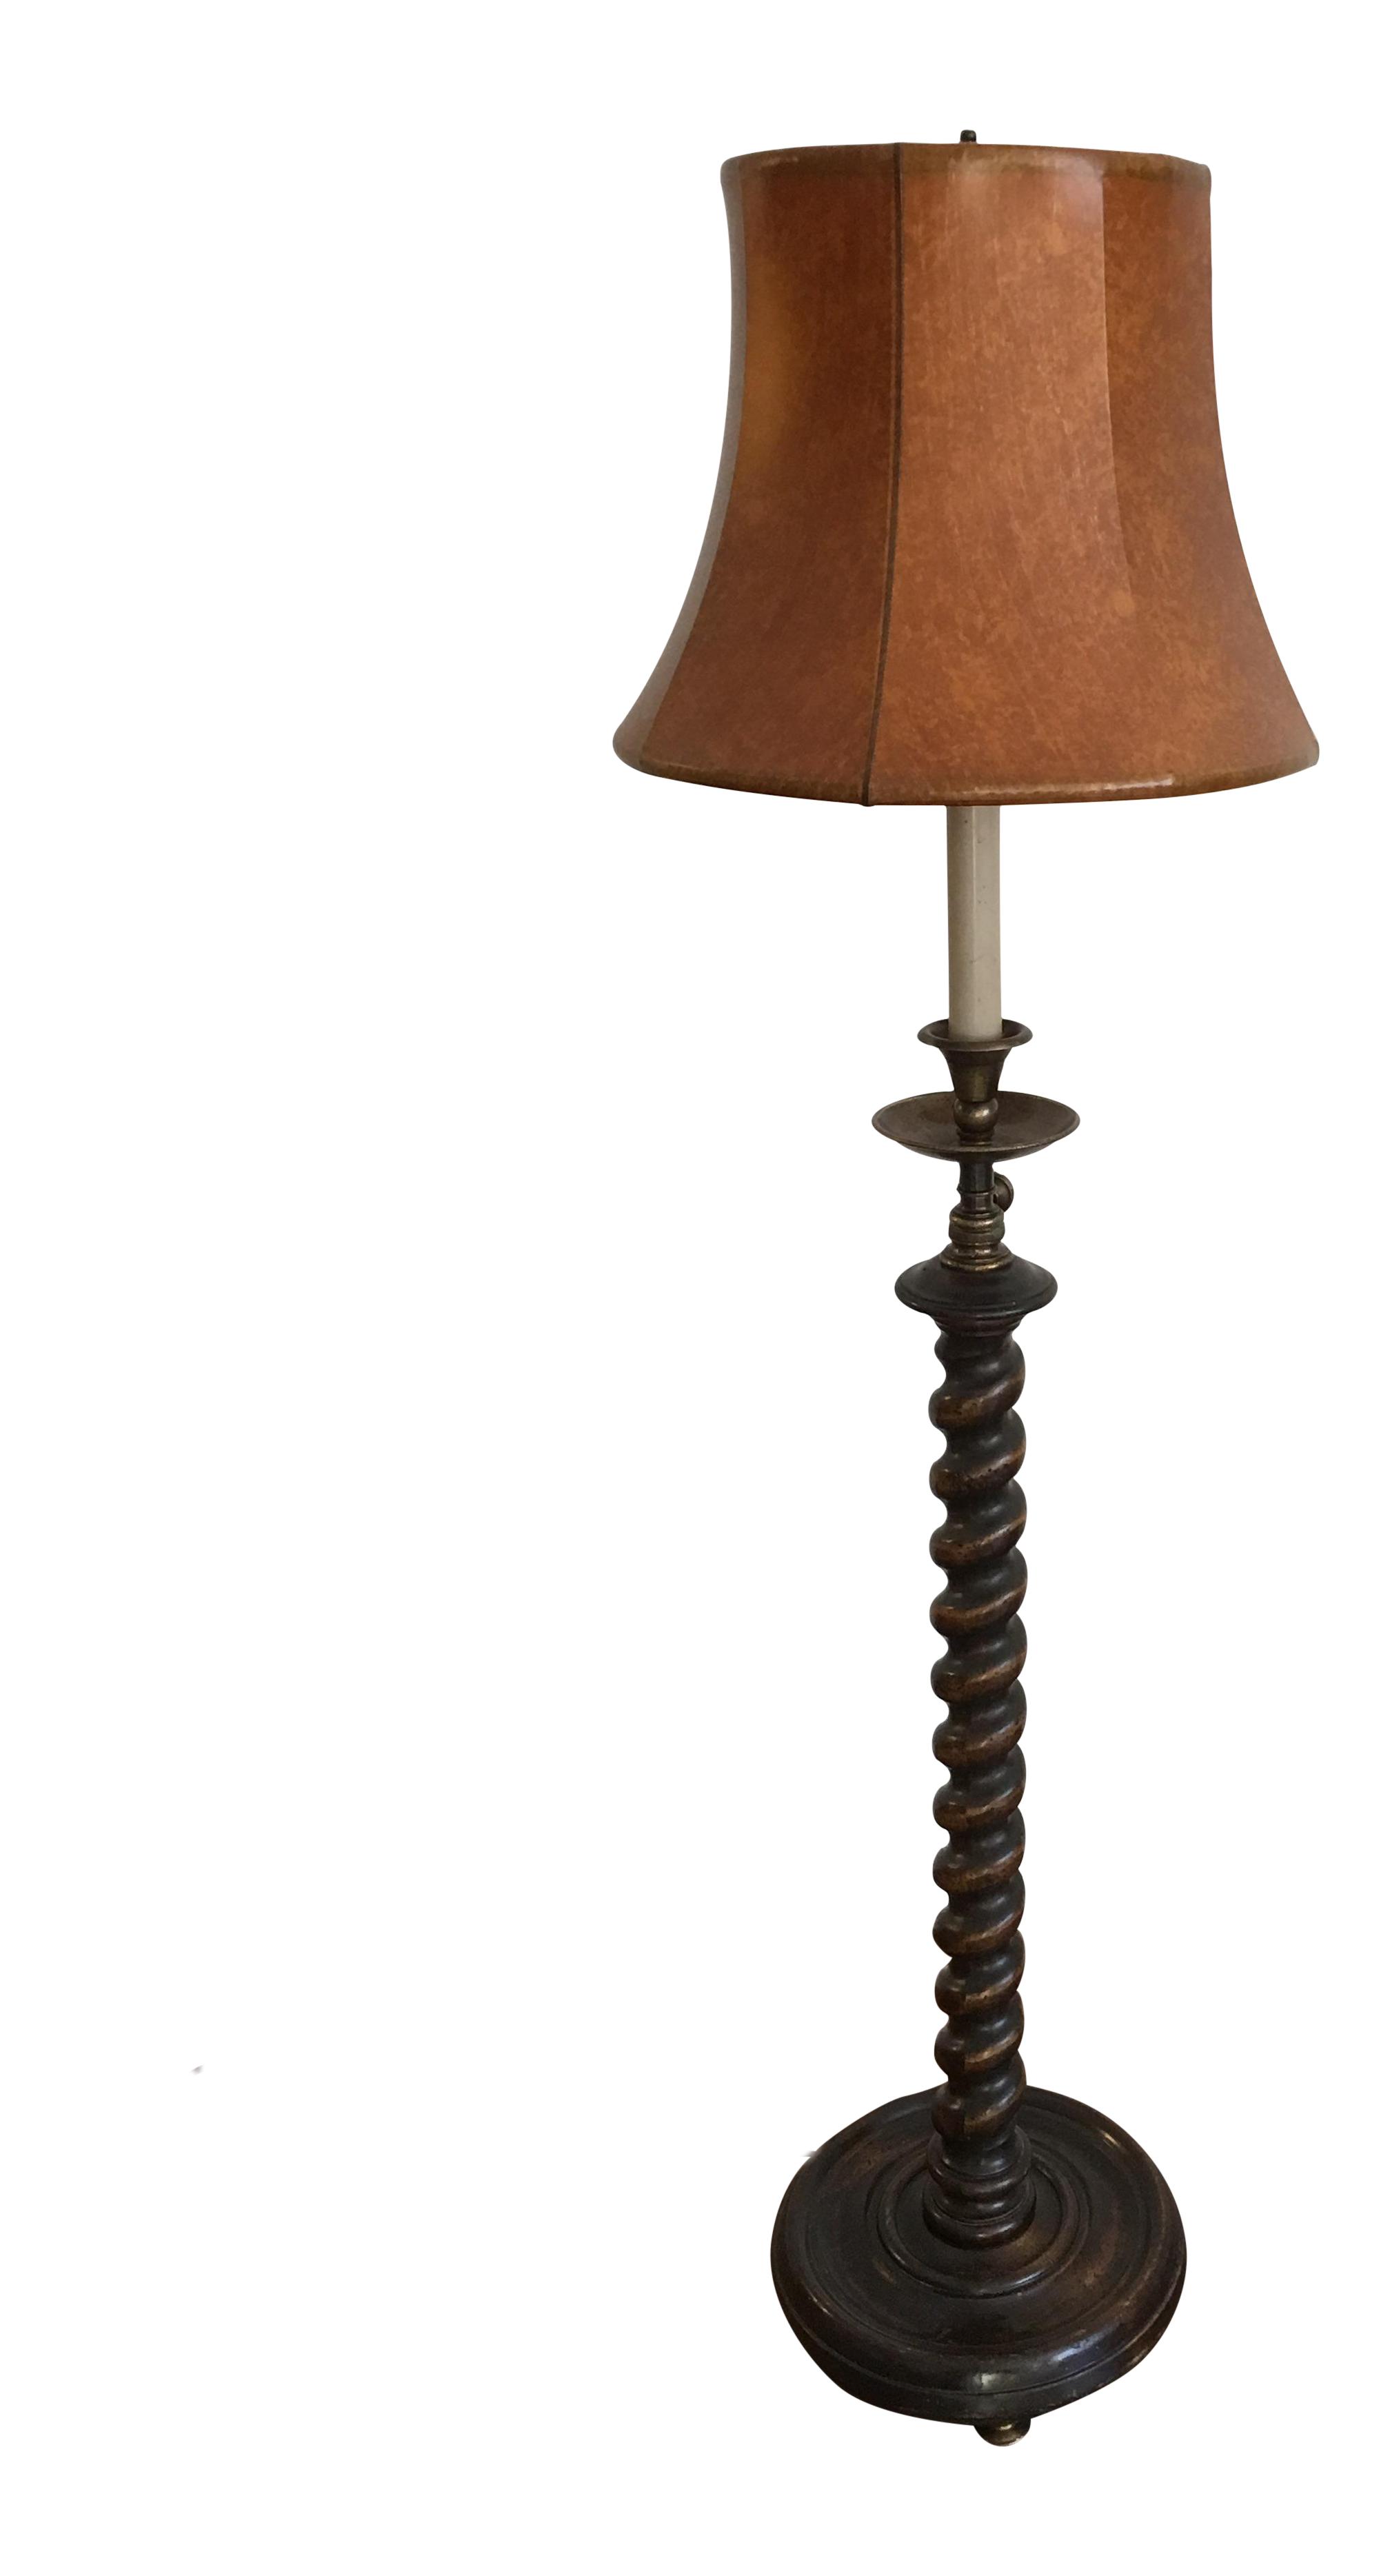 Adjustable Frederick Copper Barley Twist Table Floor Lamp Chairish